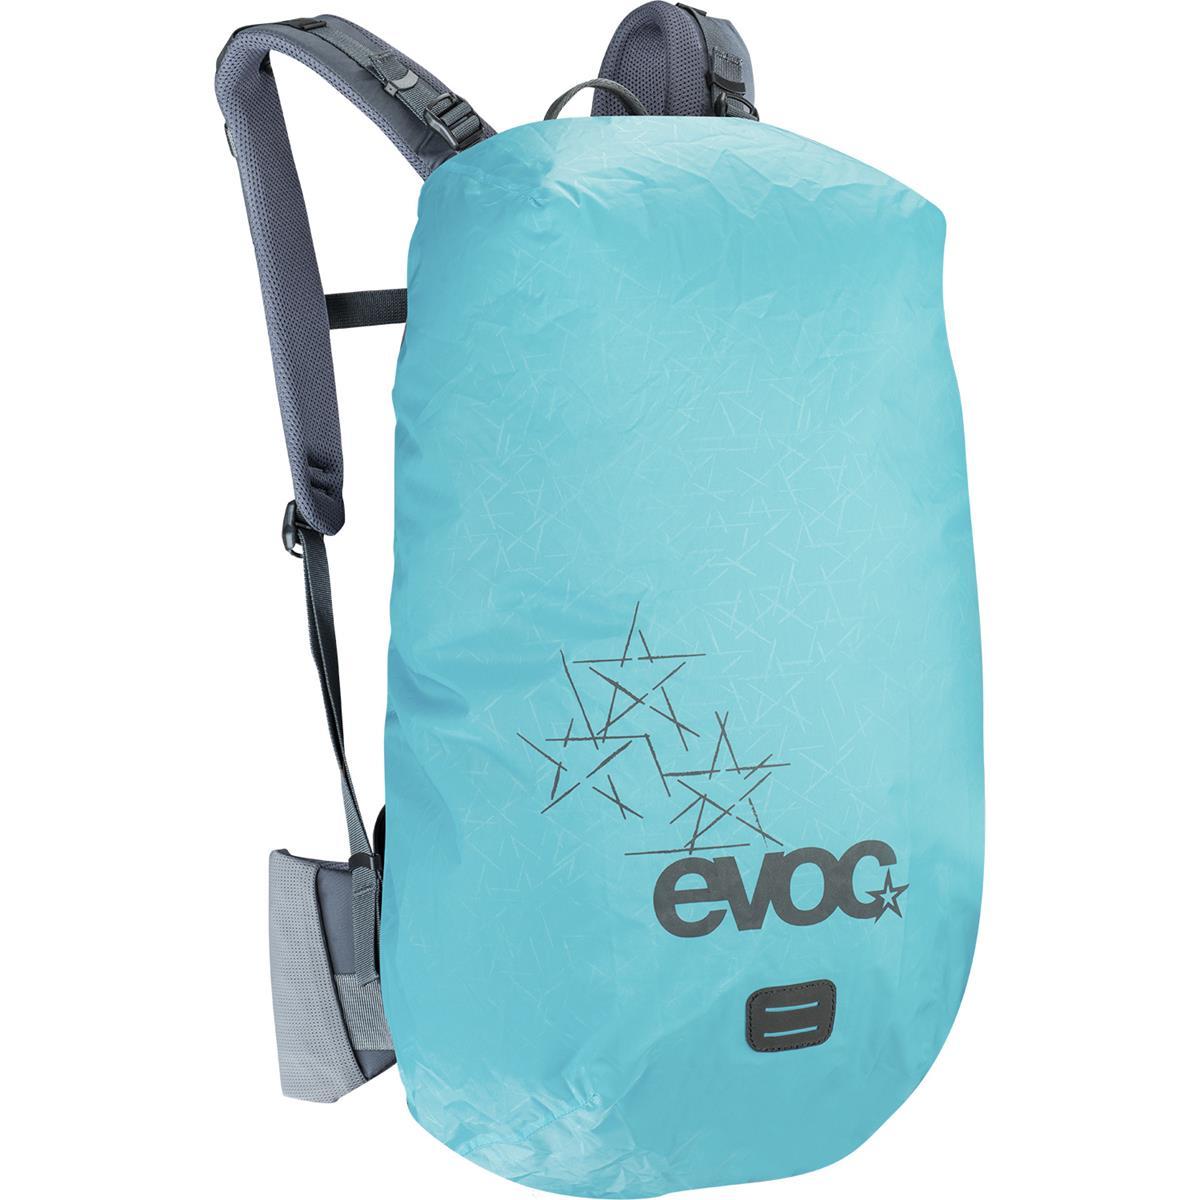 Evoc Regenhülle für Rucksack Raincover Neonblau, 25 - 45 L